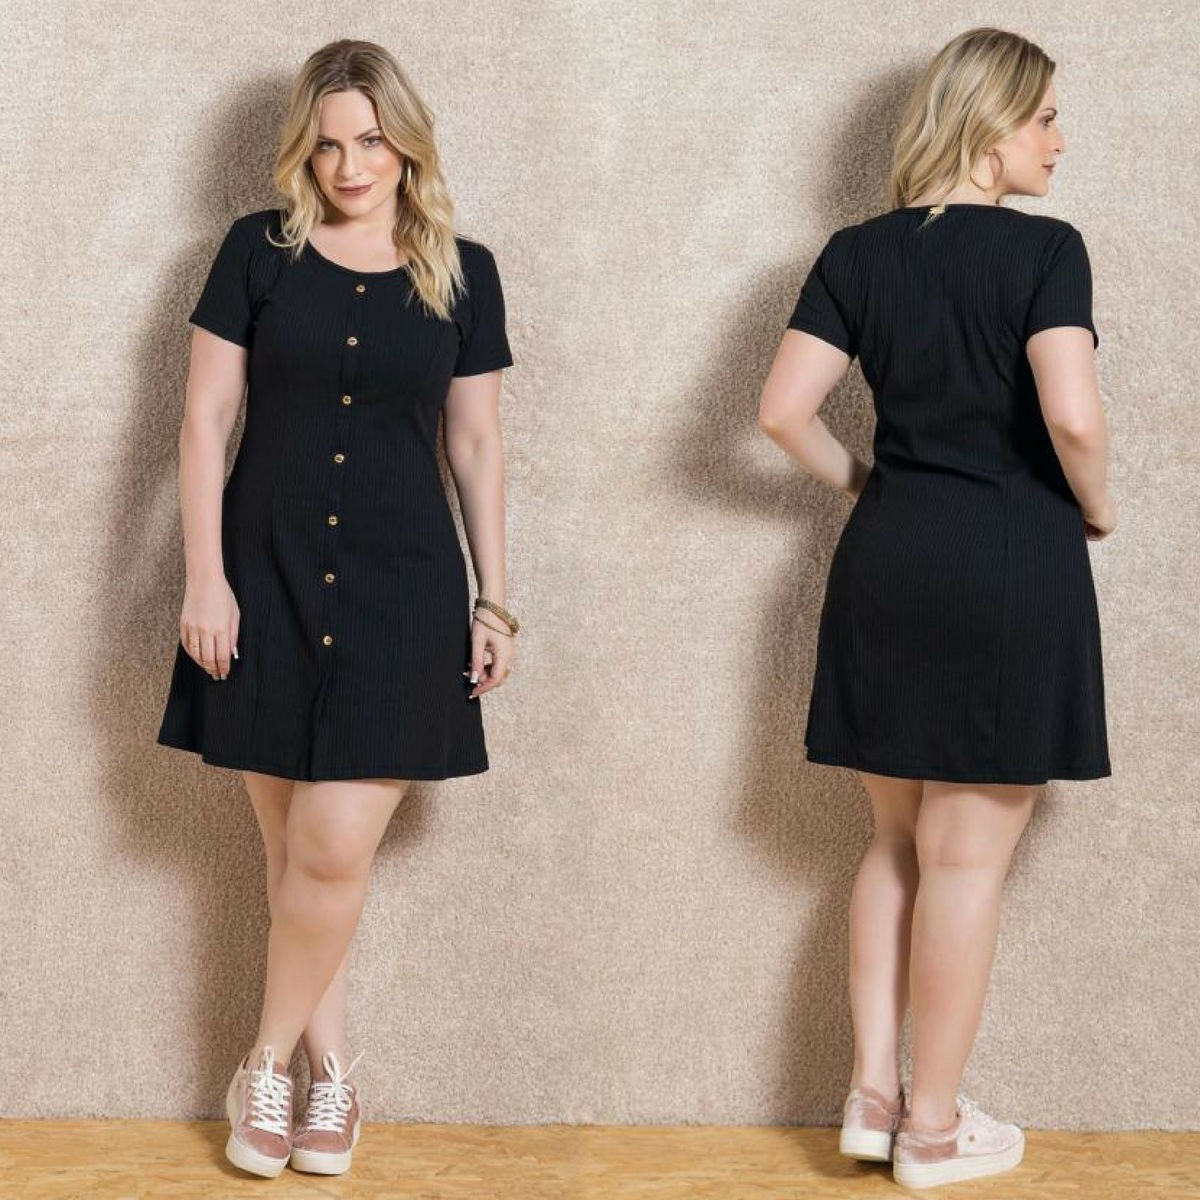 80fdf6655 vestido de festa barato plus size preto para gordinha linda. Carregando zoom .